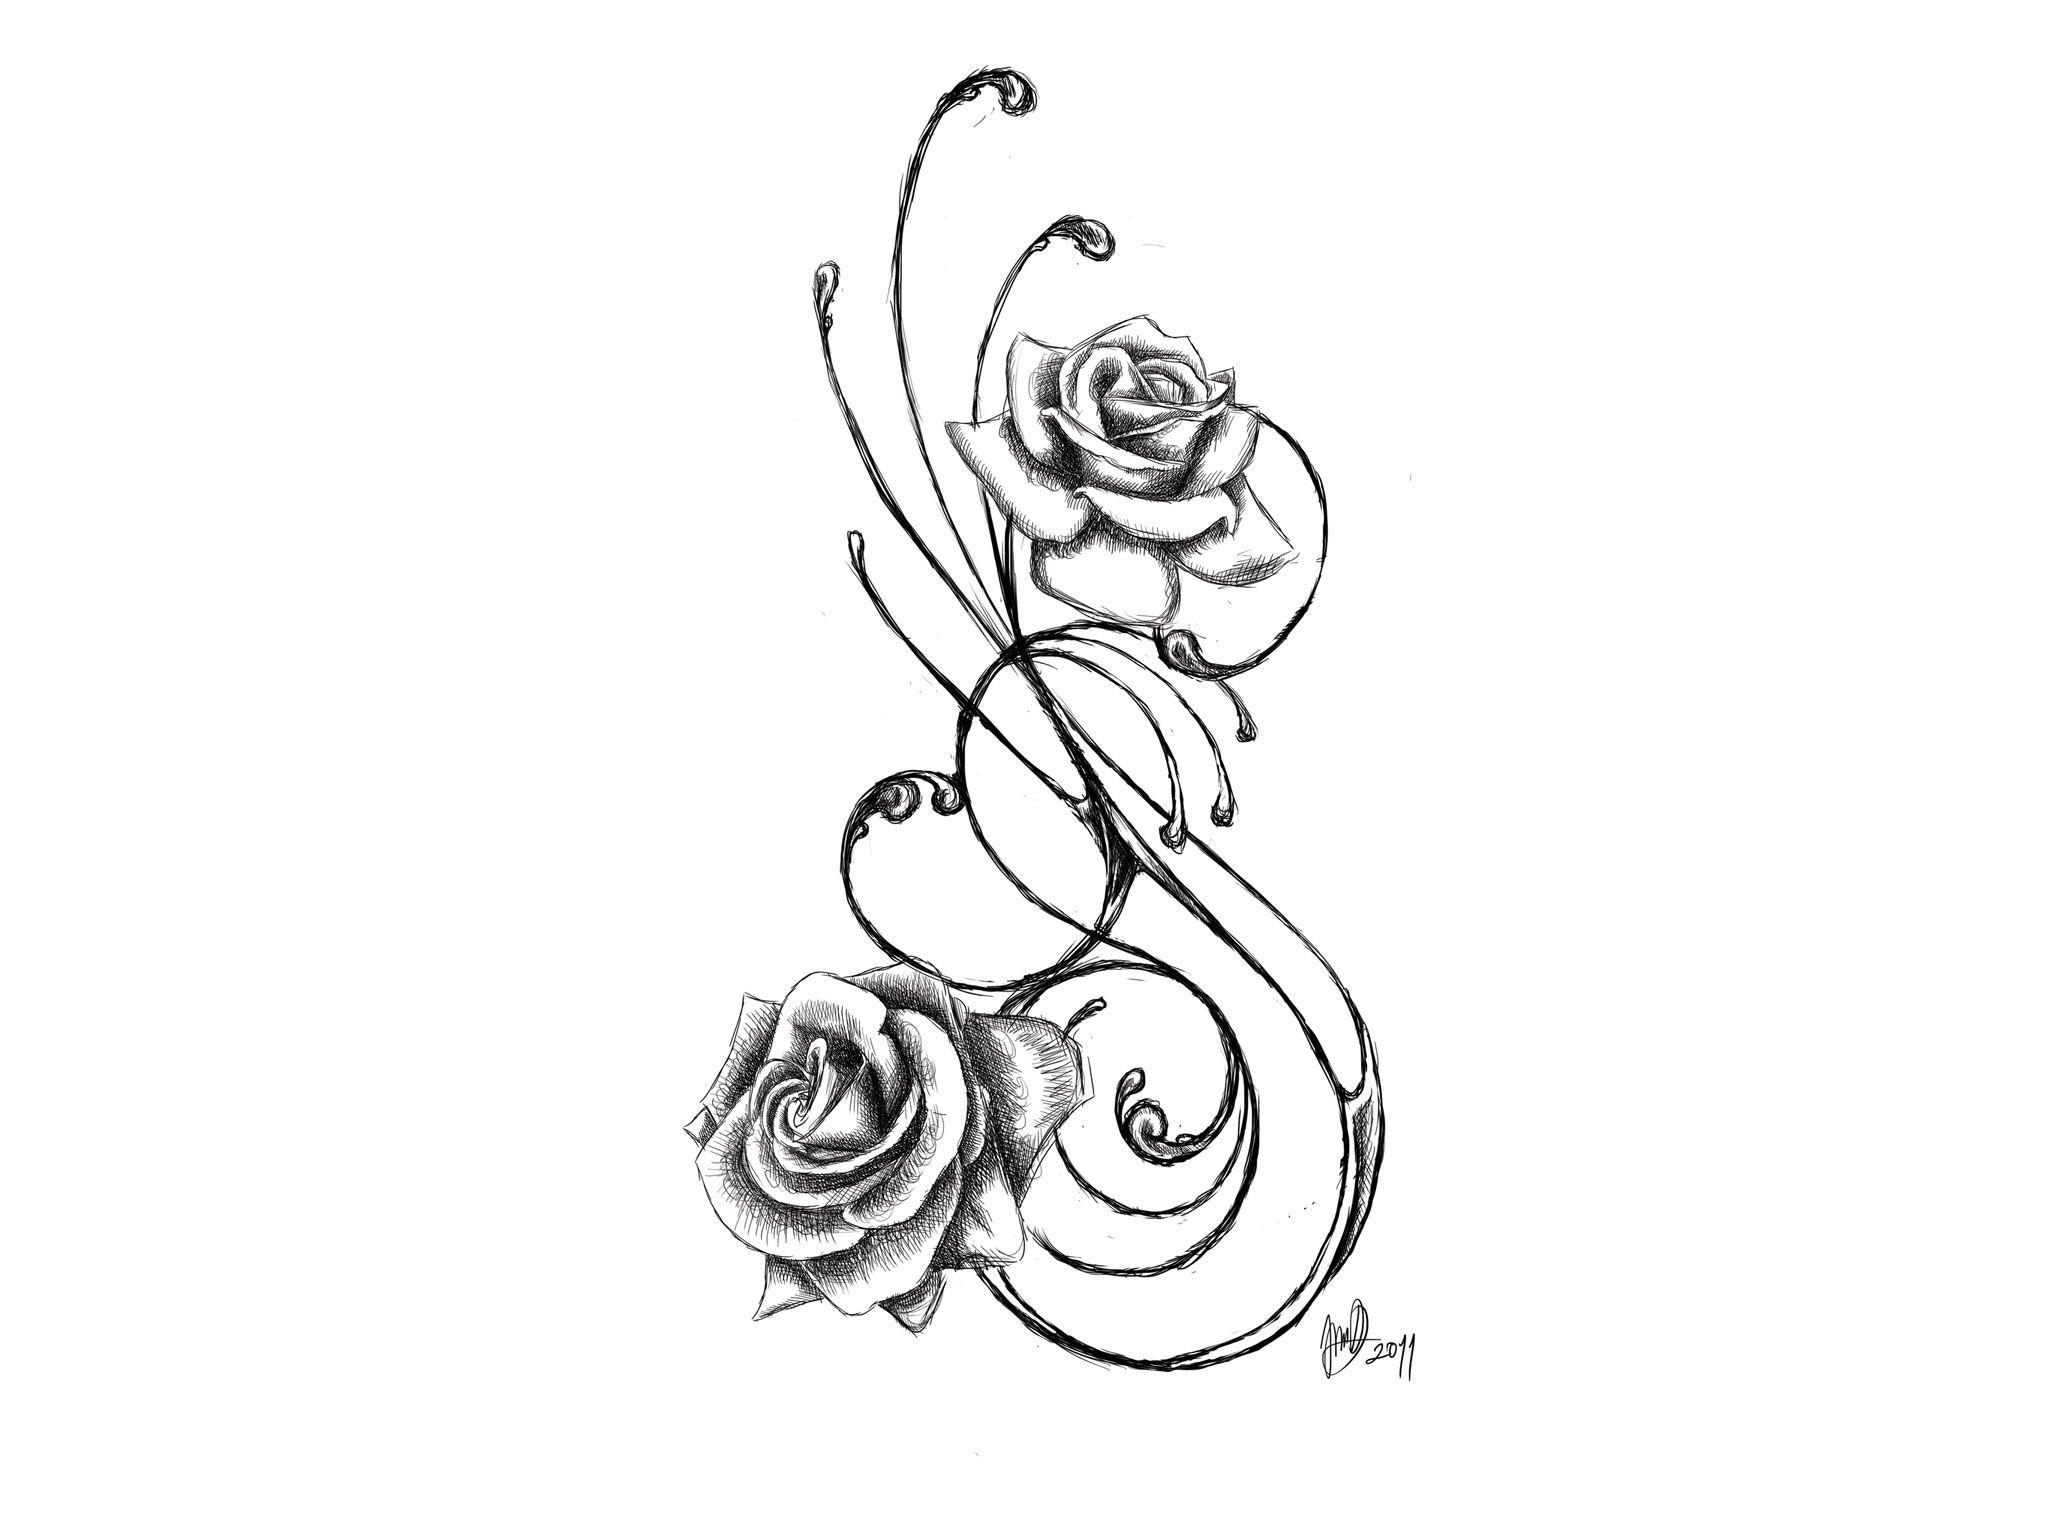 2048x1536 Tattoos Tumblr Tribal Rose Tattoo Design For Tattoos